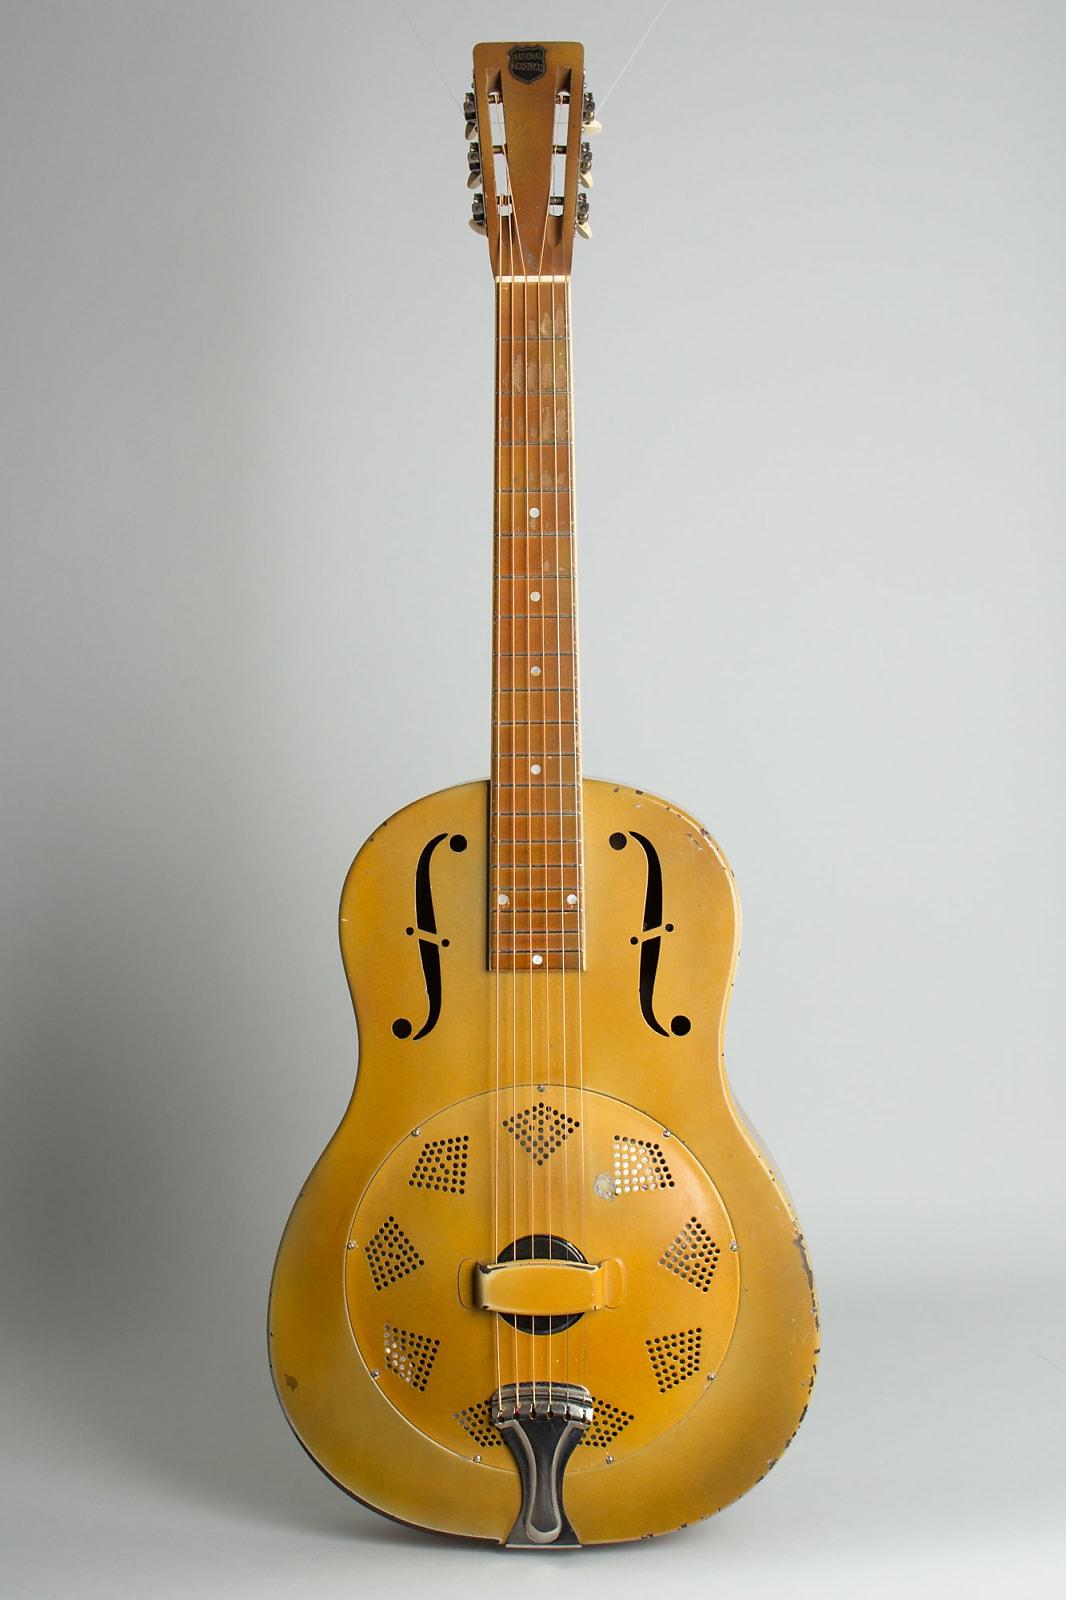 National  Triolian Resophonic Guitar (1931), ser. #972 P, black tolex hard shell case.